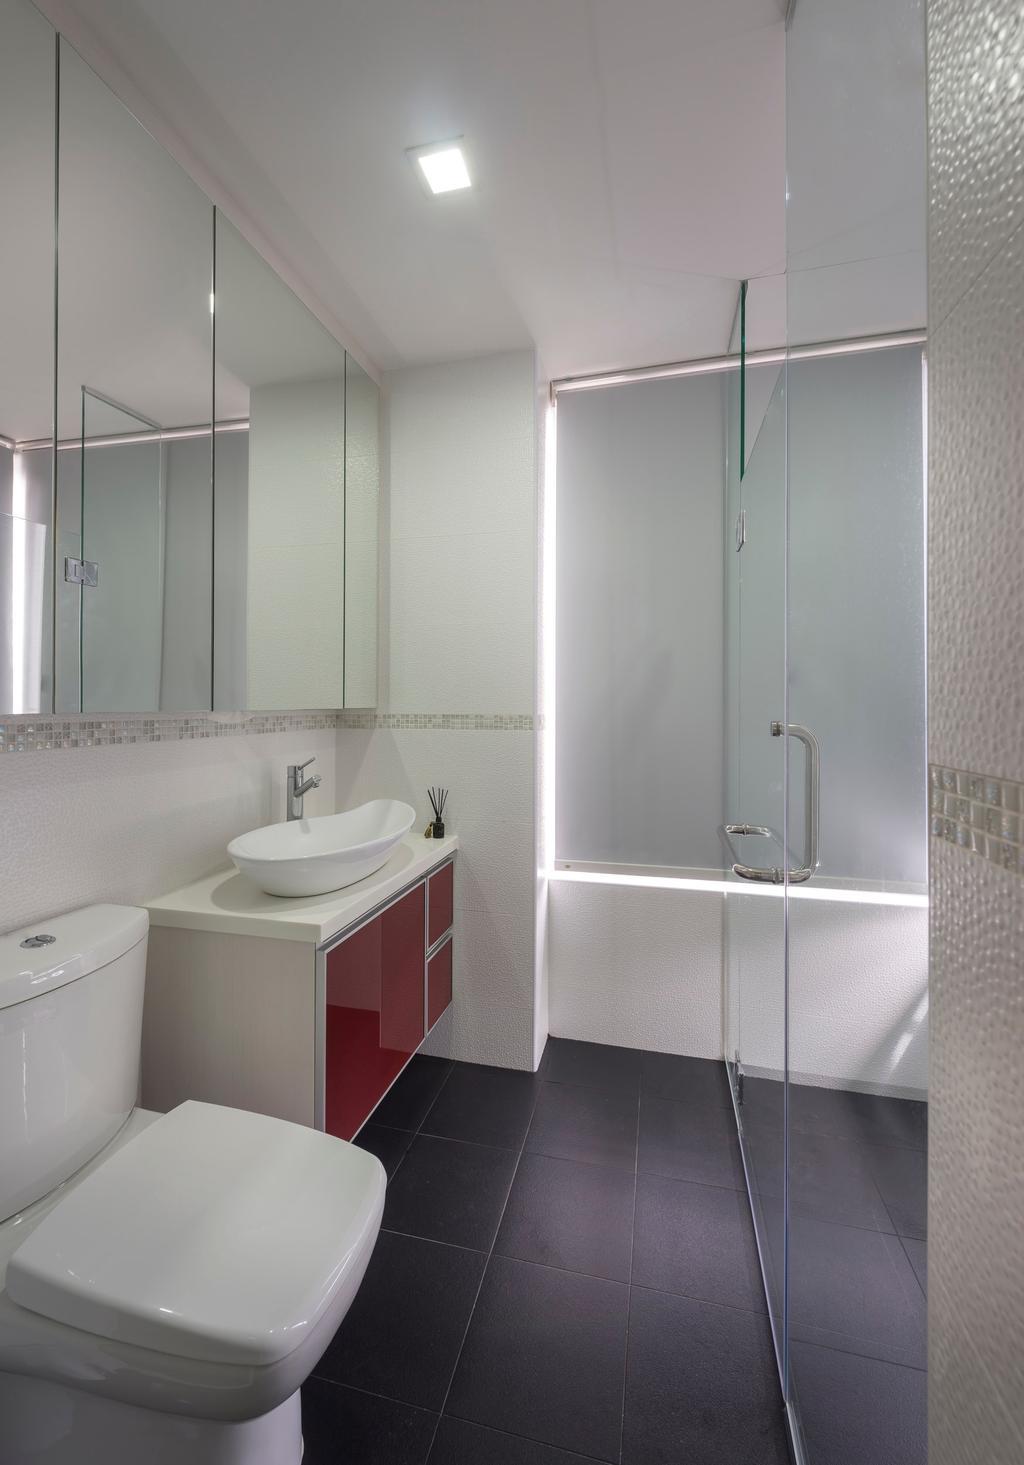 Contemporary, Condo, Bathroom, De Royale, Interior Designer, Space Factor, Tile, Tiles, Blinds, Glass Cubicle, Bathroom Counter, Vessel Sink, Mirror, Mosaic, Mosaic Tiles, White, Indoors, Interior Design, Room, Appliance, Electrical Device, Washer